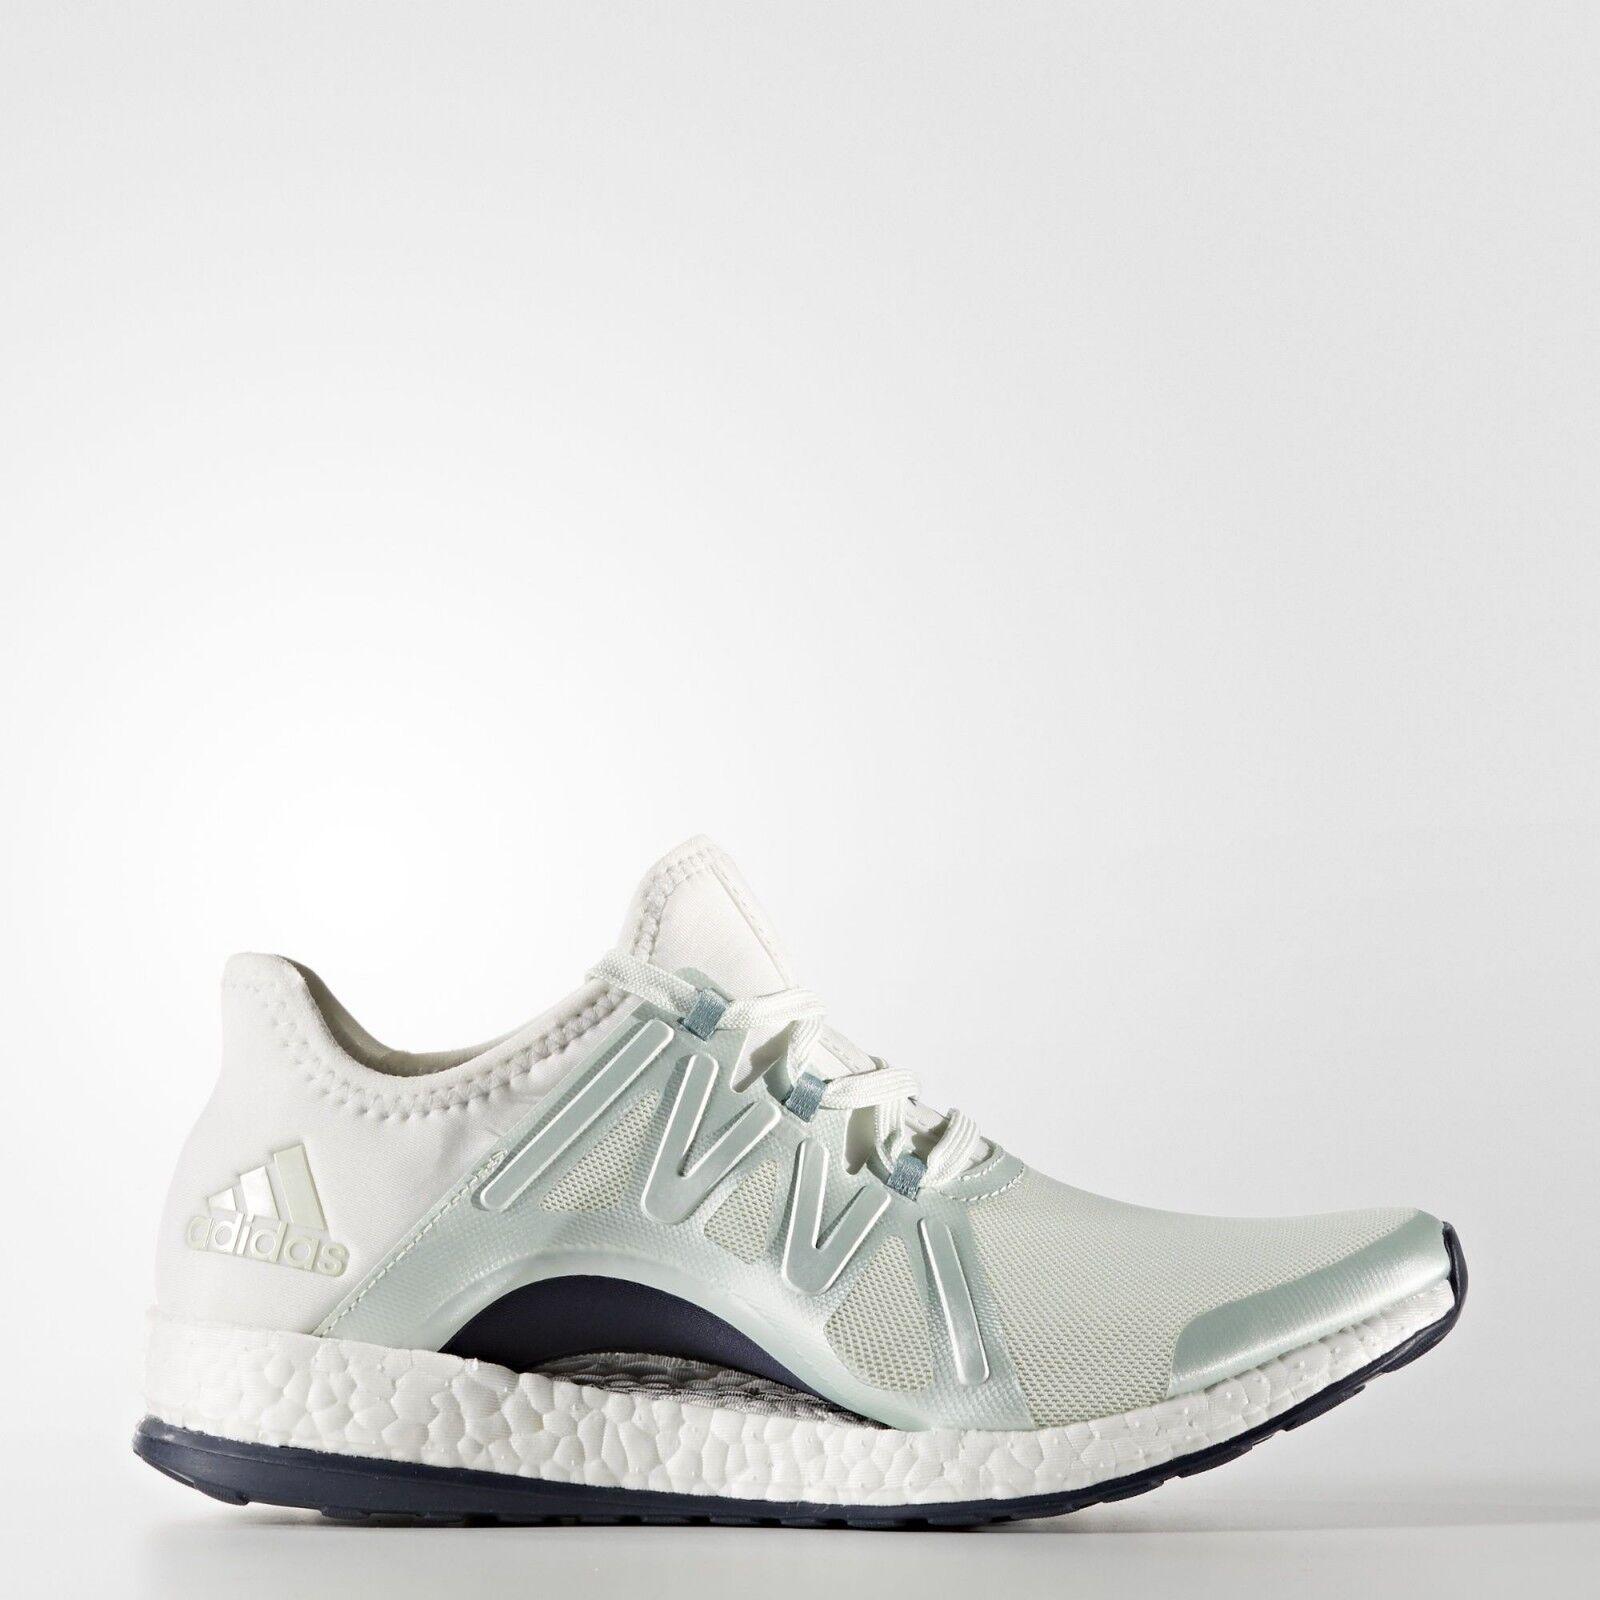 Adidas BB1732 Női Pureboost X POSE futócipő zöld, fehér szürke cipők